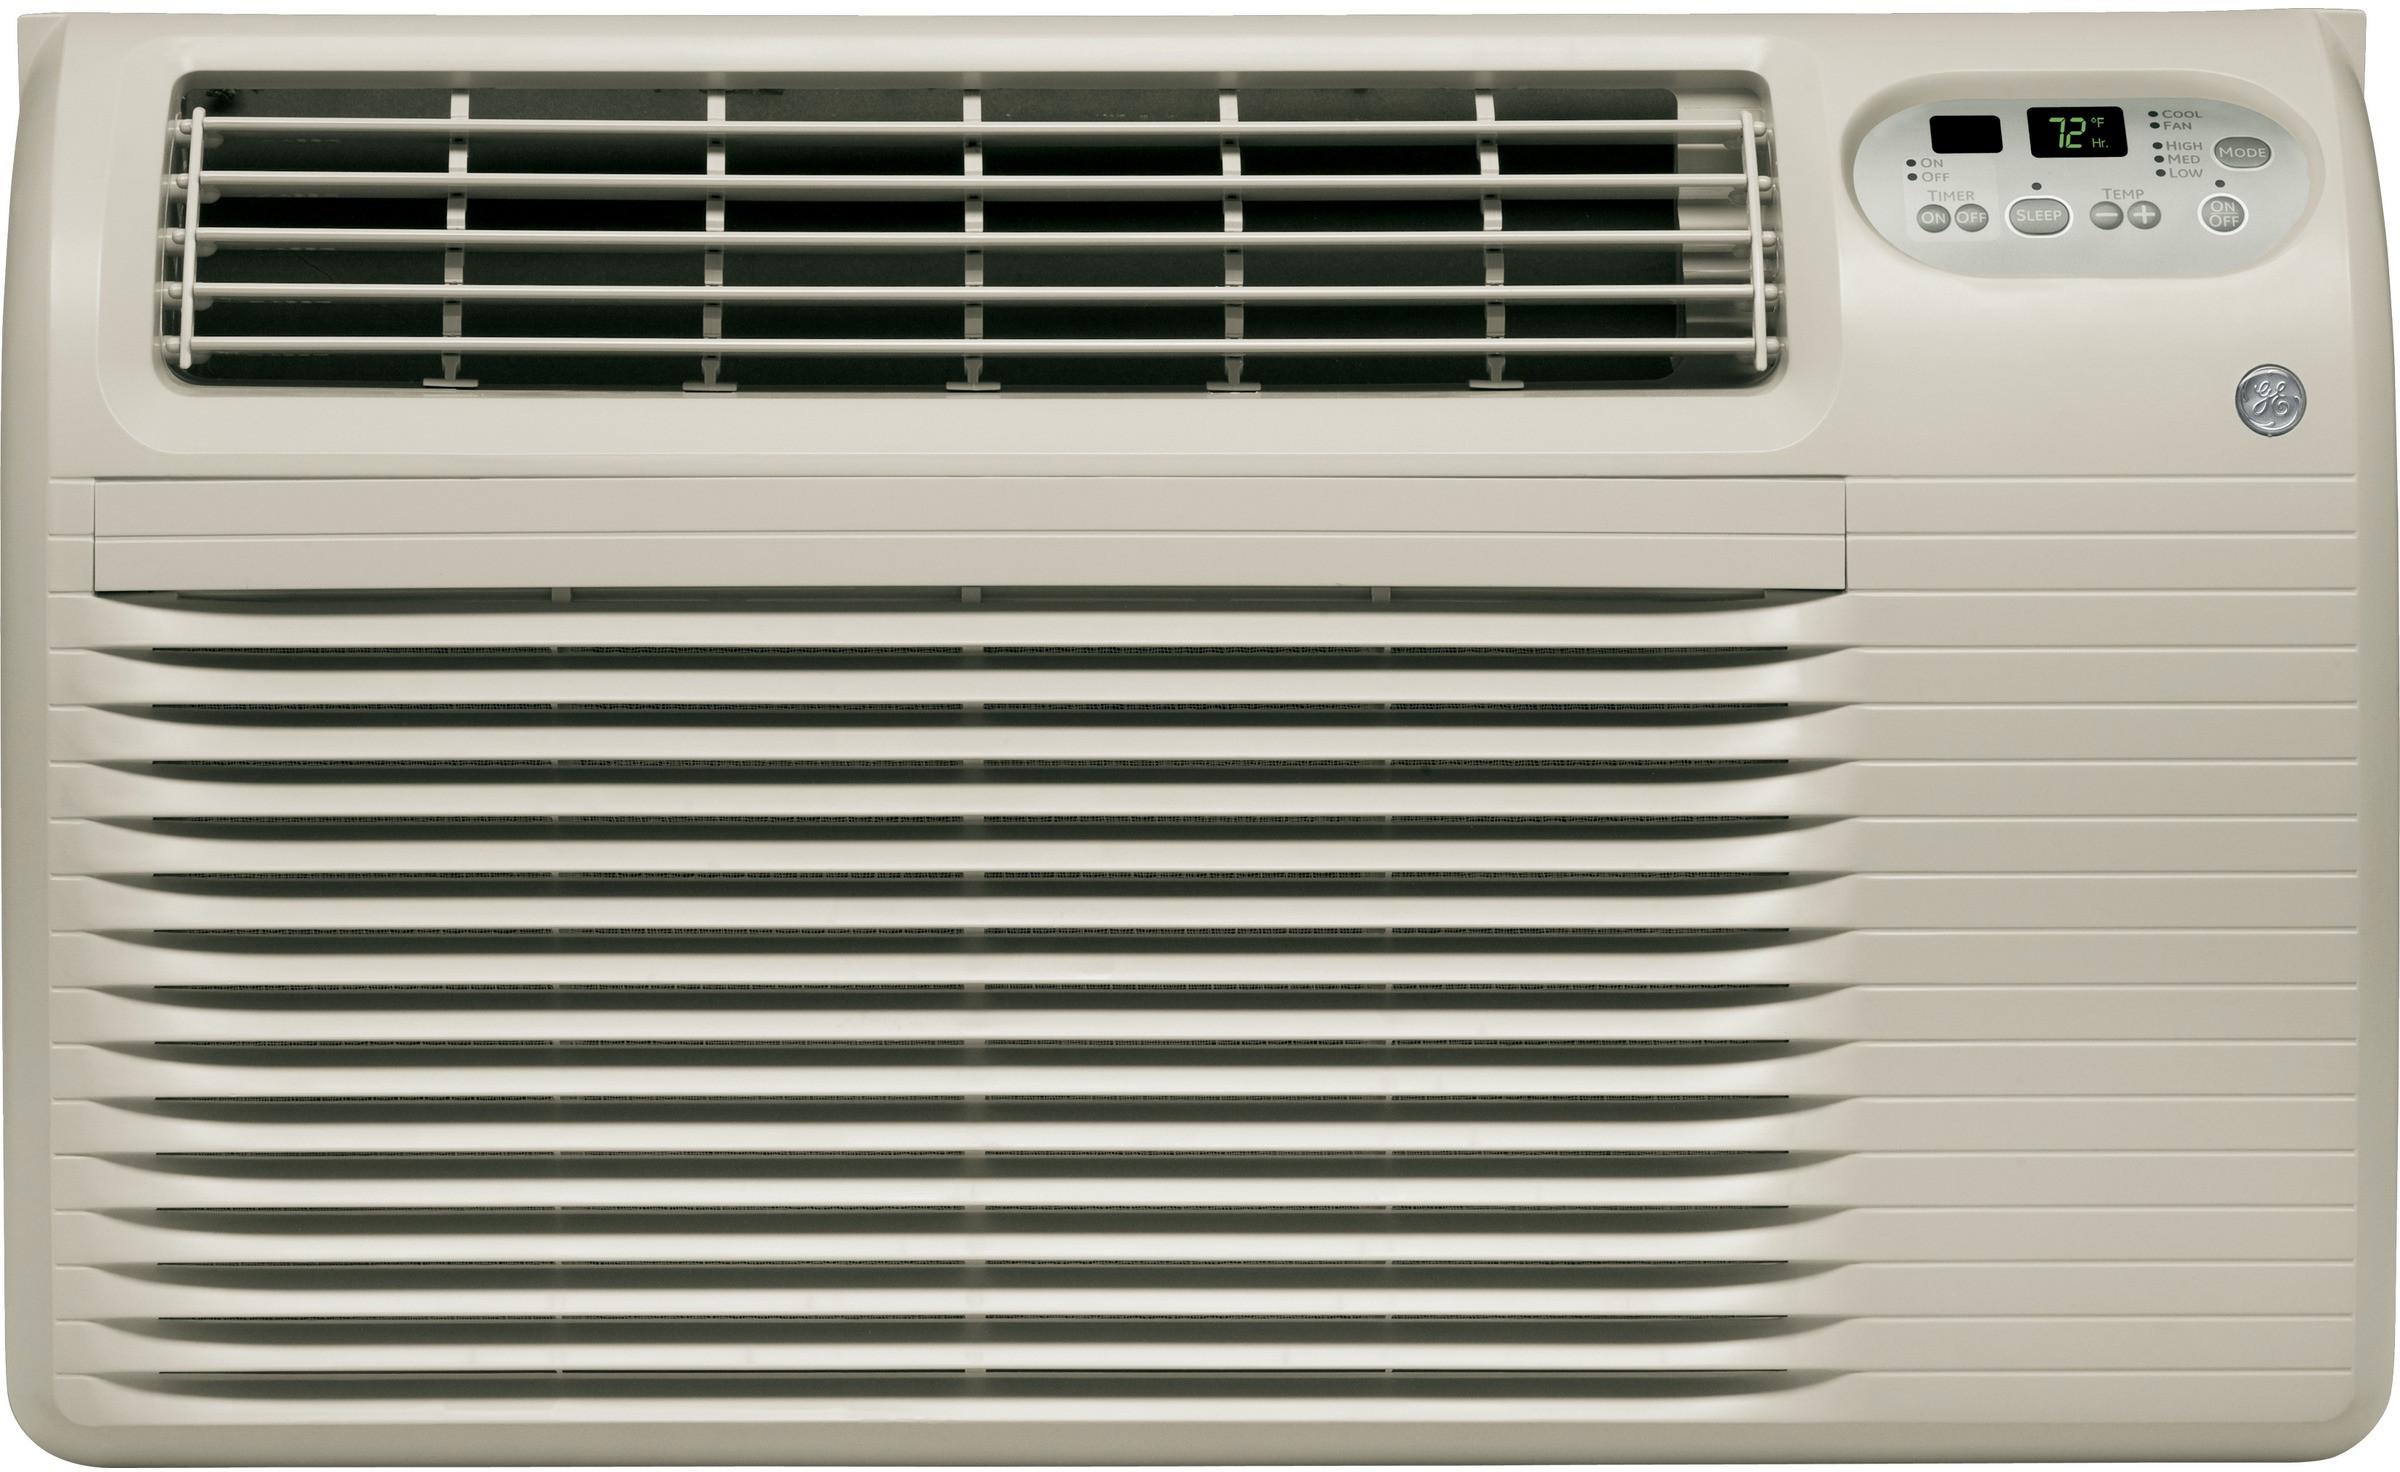 Ge Ajcq10ace 10 400 Btu Through The Wall Air Conditioner